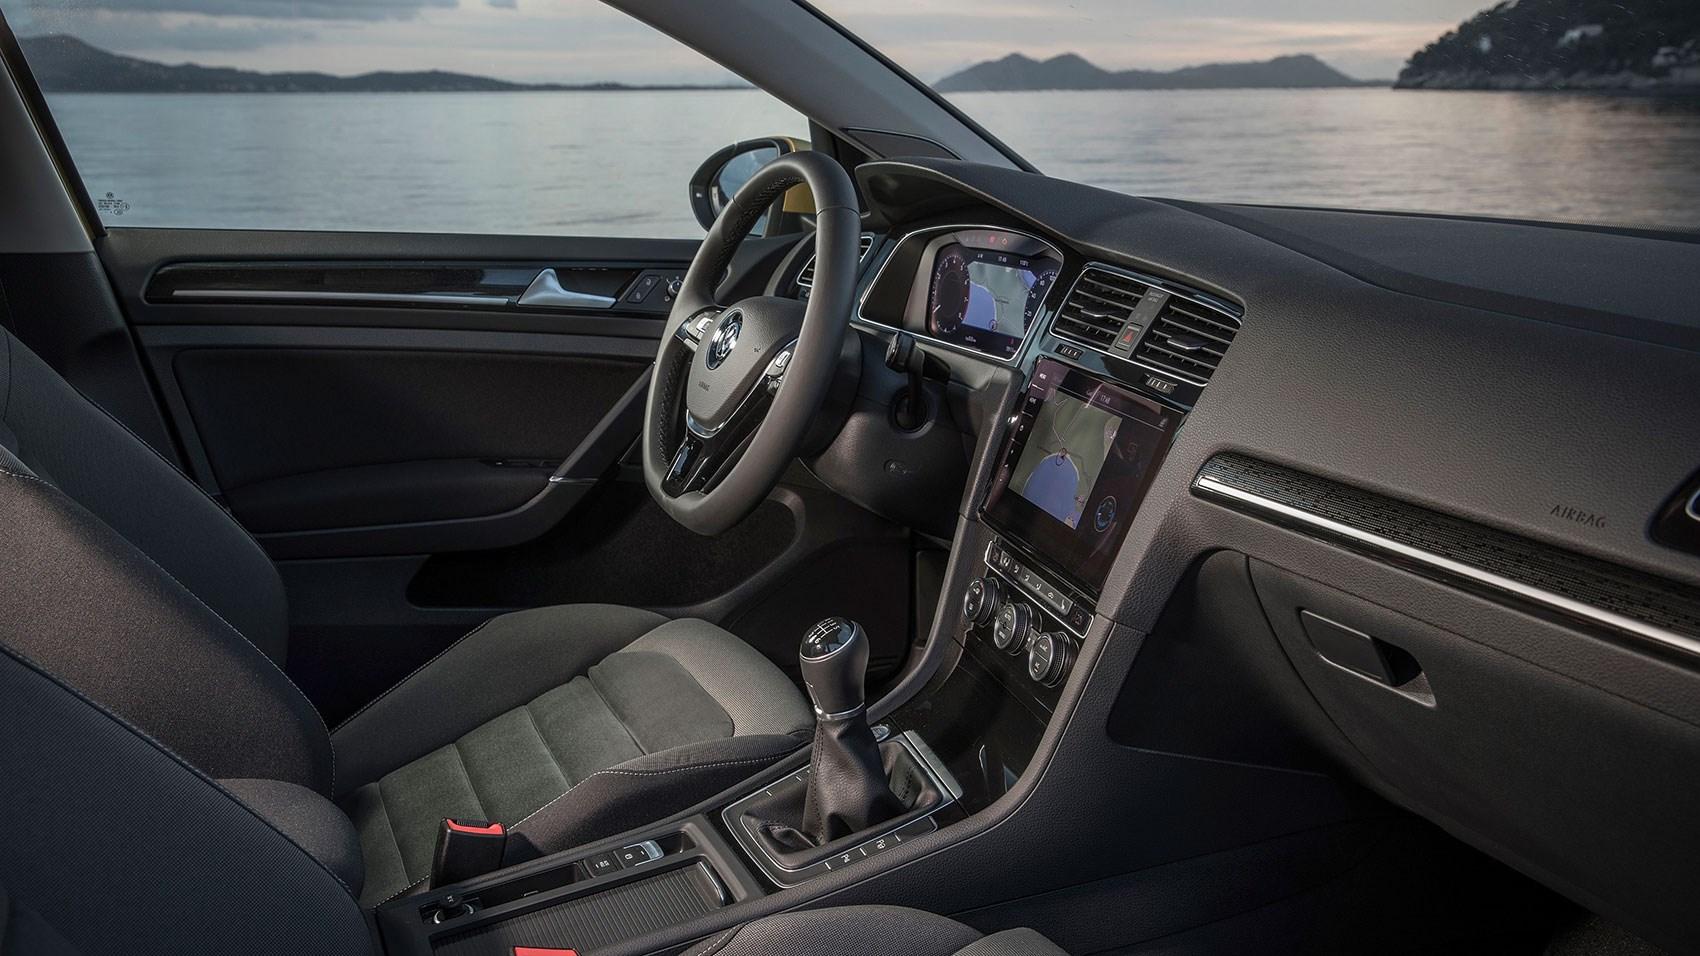 Cabin of new 2017 VW Golf